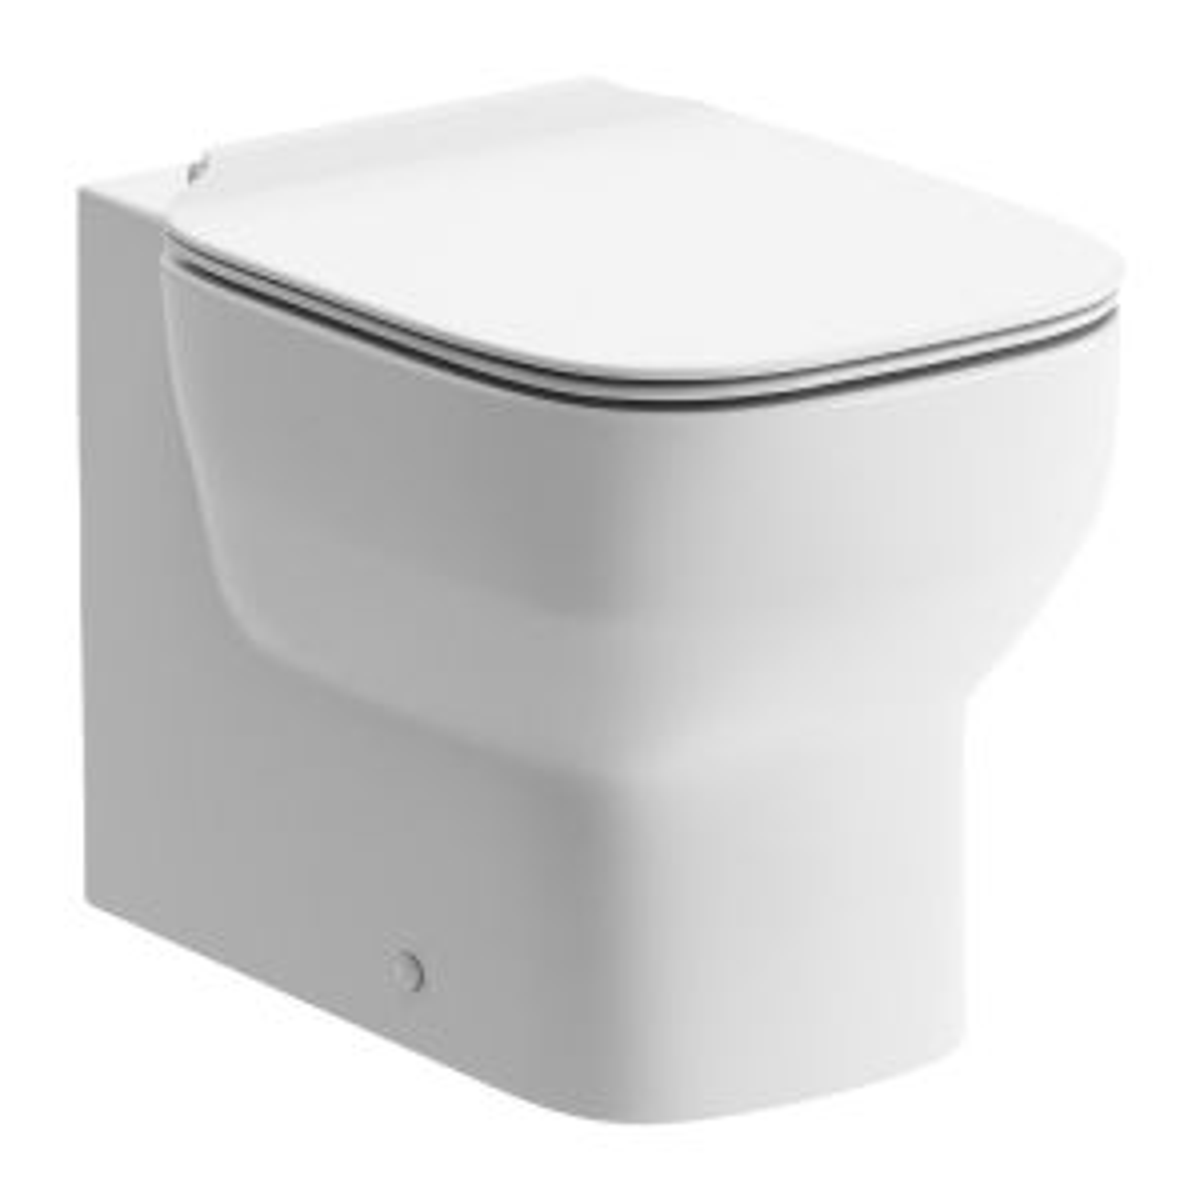 BTL Senna Back To Wall Toilet with Soft Close Seat